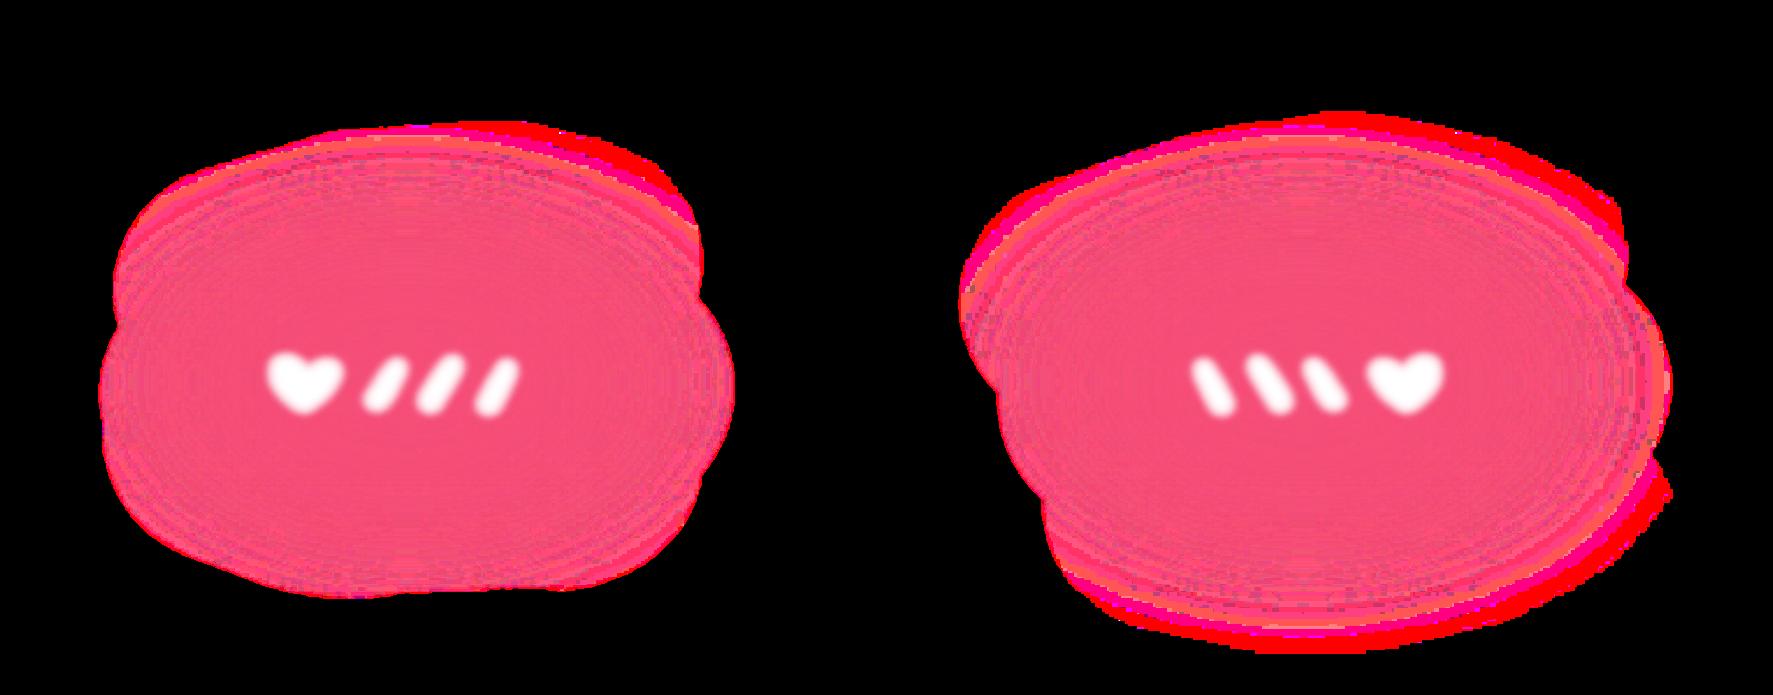 Freetoedit Pink Mochi Blush Sonrojo Rosa Kawaii Cute Heart Remixed From Haosuwu Blushing Anime Drawing Anime Clothes Overlays Picsart